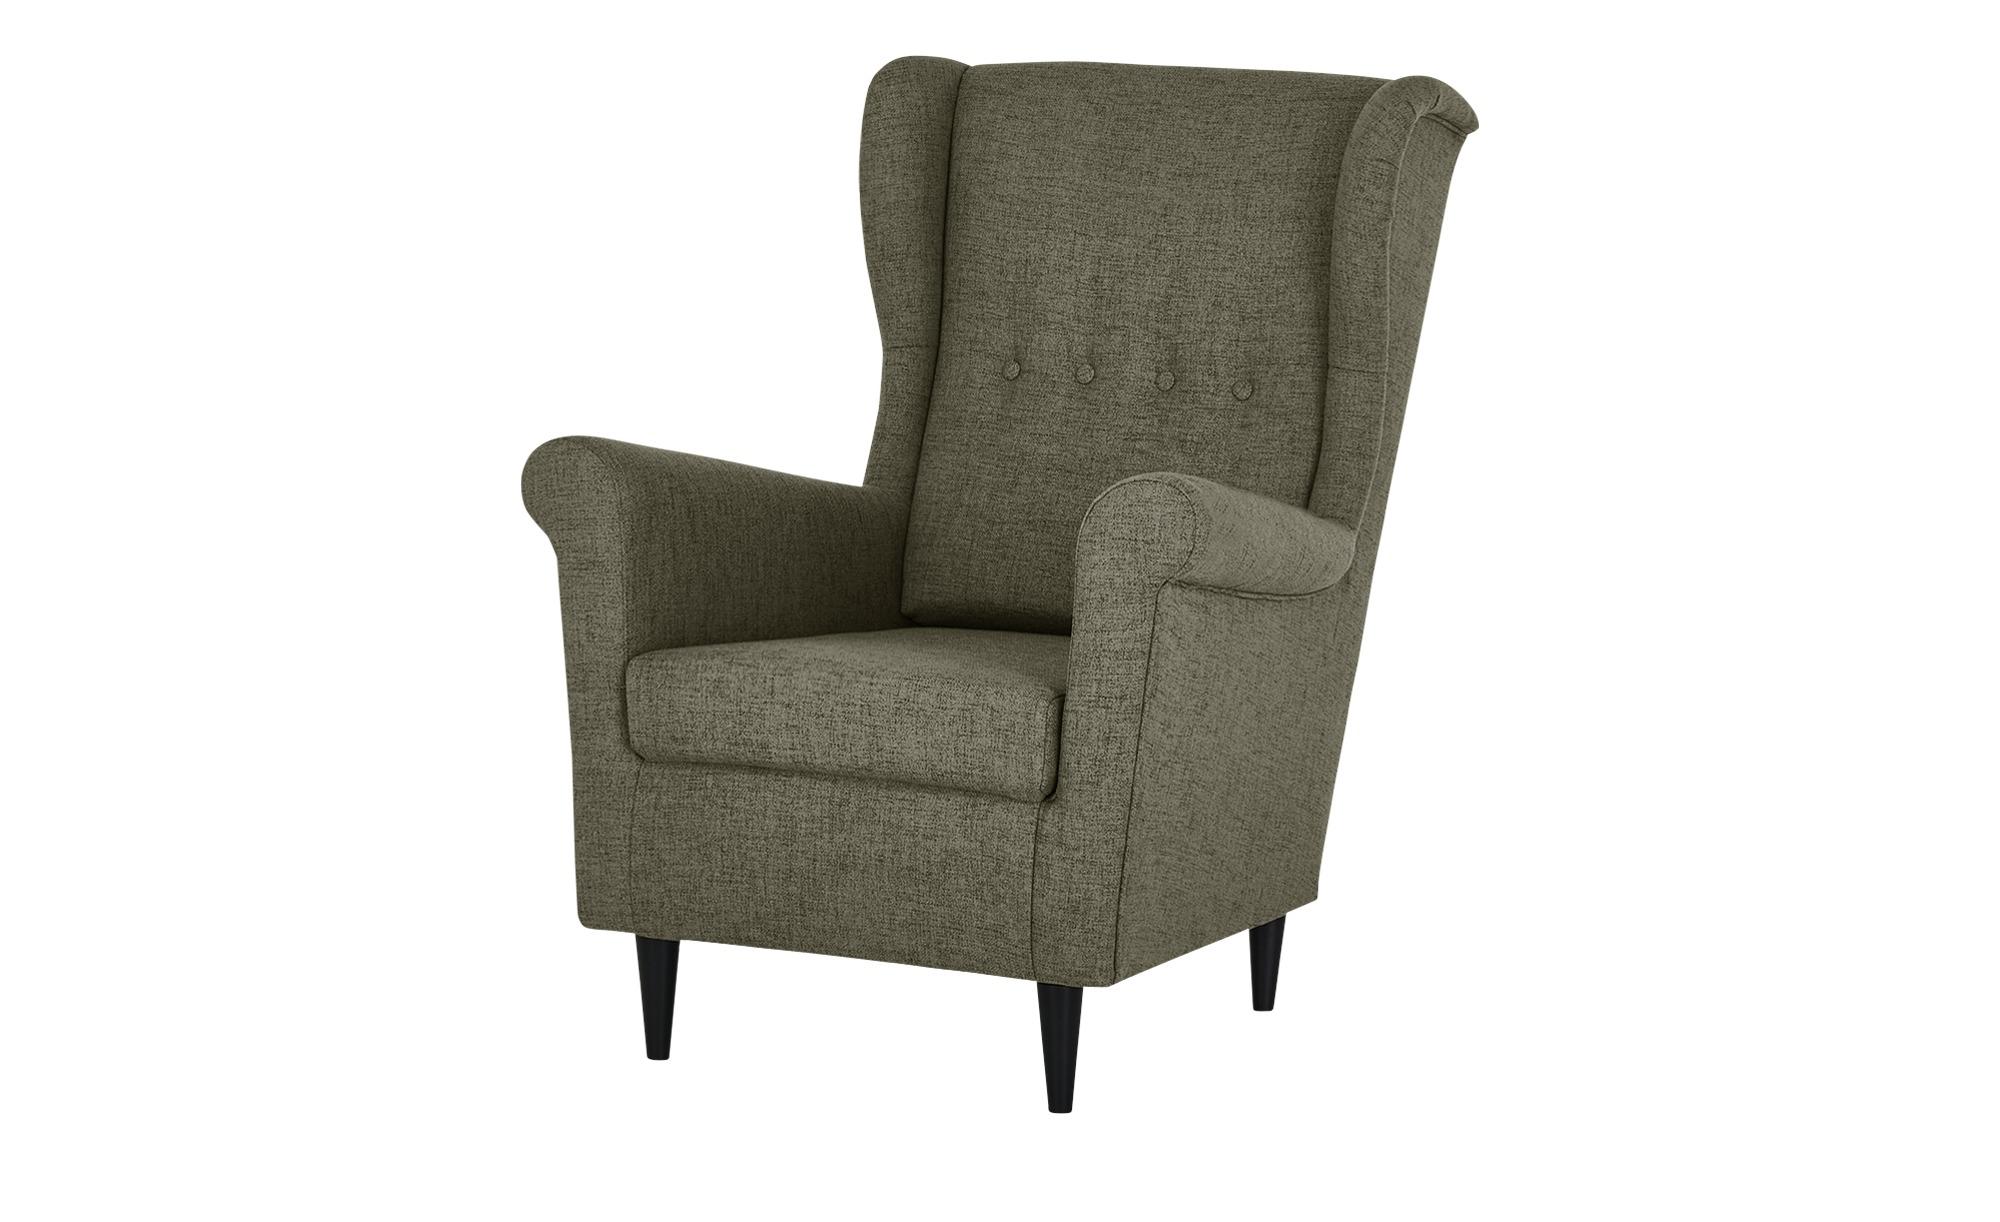 smart Sessel  Hubertine ¦ braun ¦ Maße (cm): B: 82 H: 102 T: 89 Polstermöbel > Sessel > Ohrensessel - Höffner